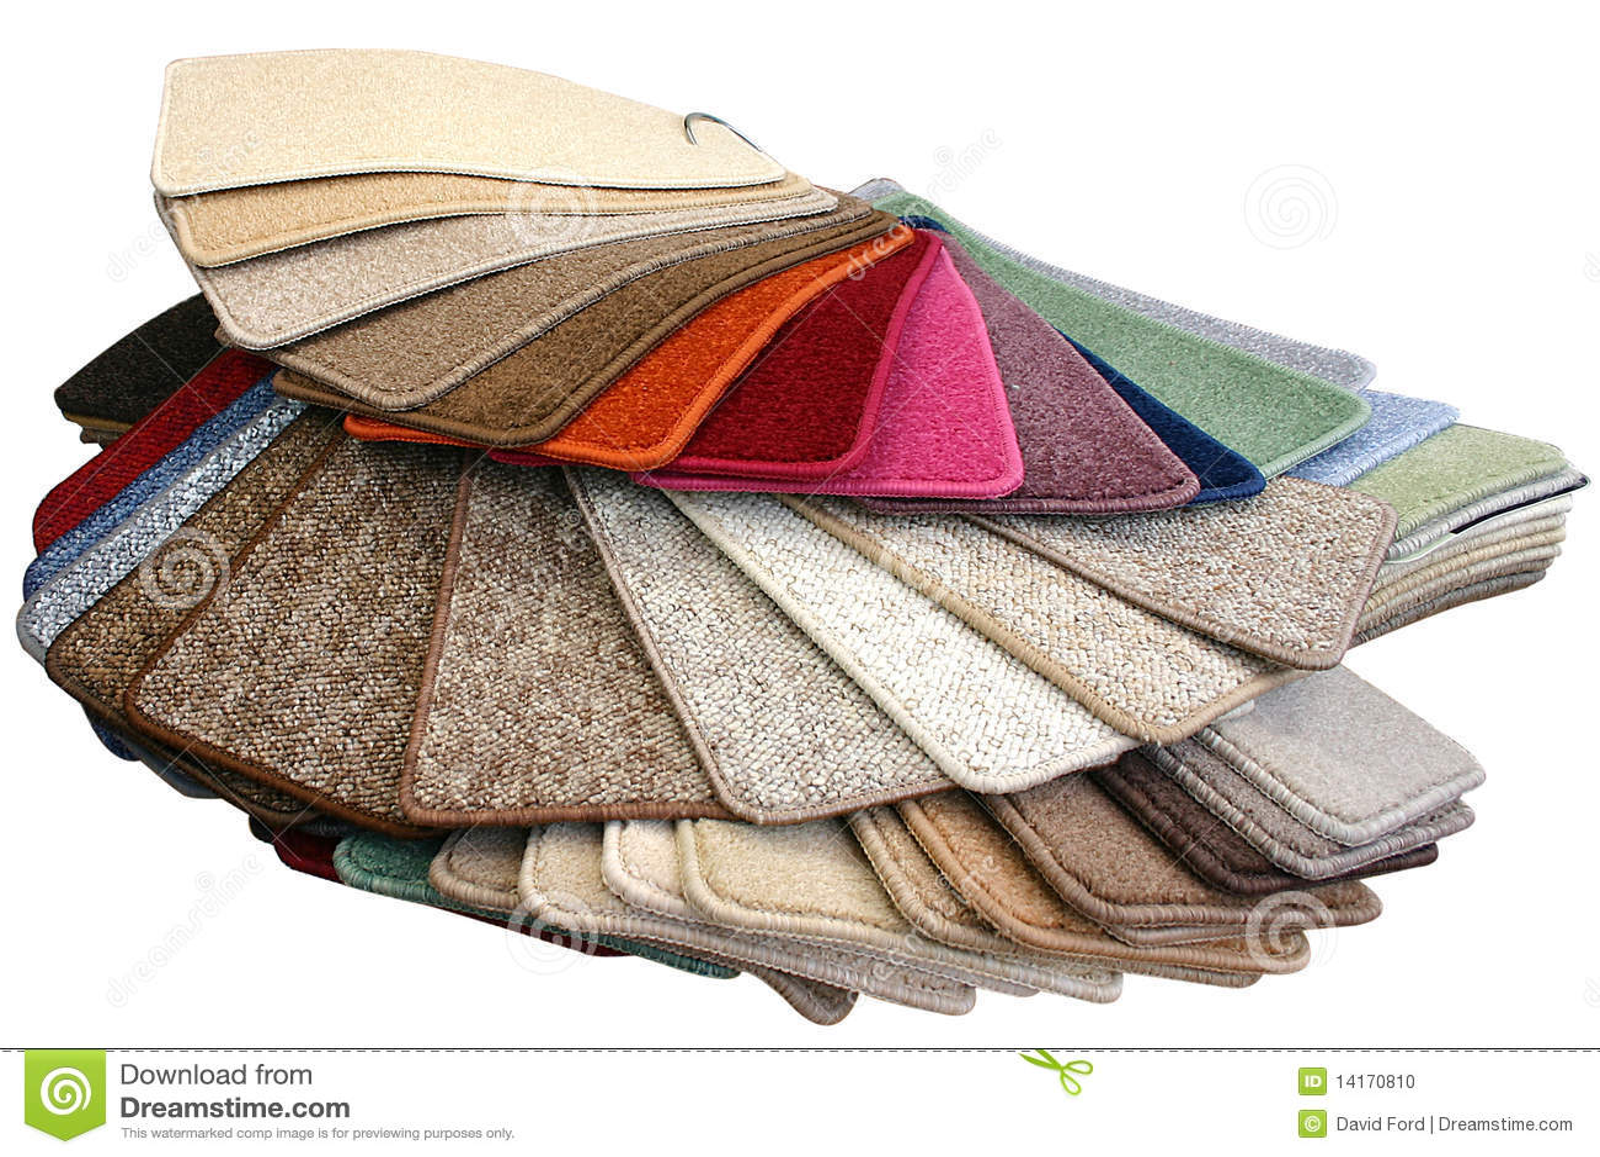 Carpet Samples Stock Photo - Image: 14170810